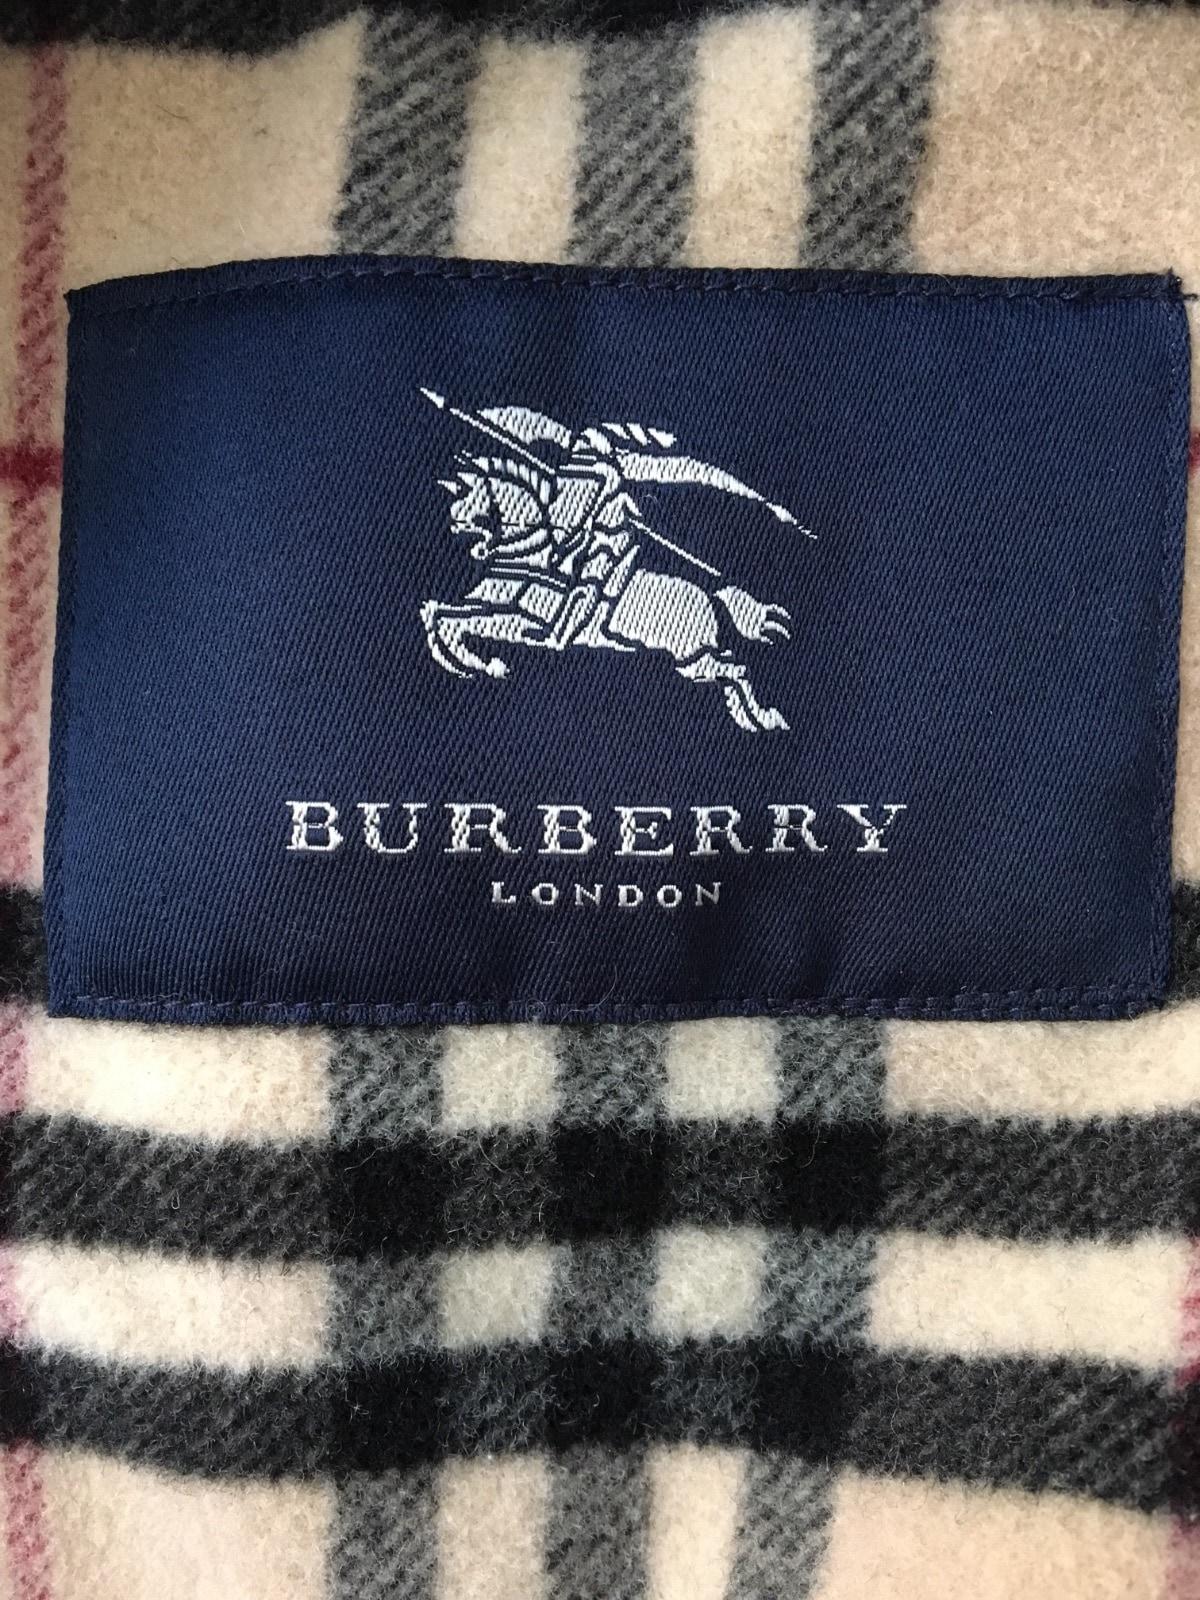 Burberry LONDON(バーバリーロンドン)のダウンコート